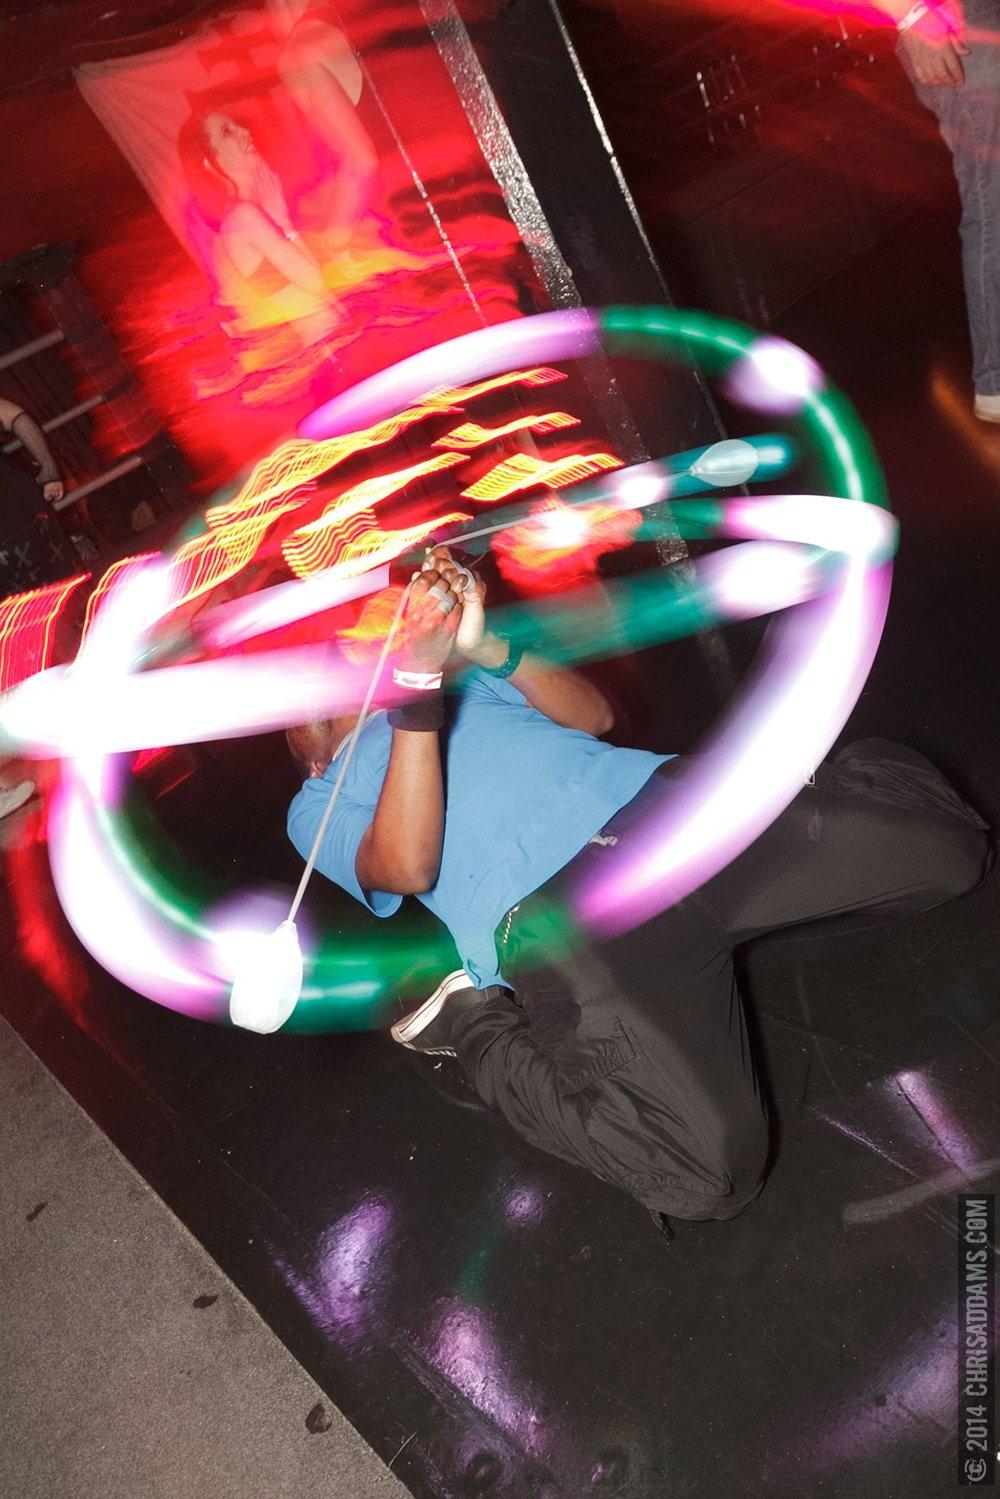 TheHavenClub-Goth-Industrial-Dance-Alternative-Northampton-MA (91).jpg